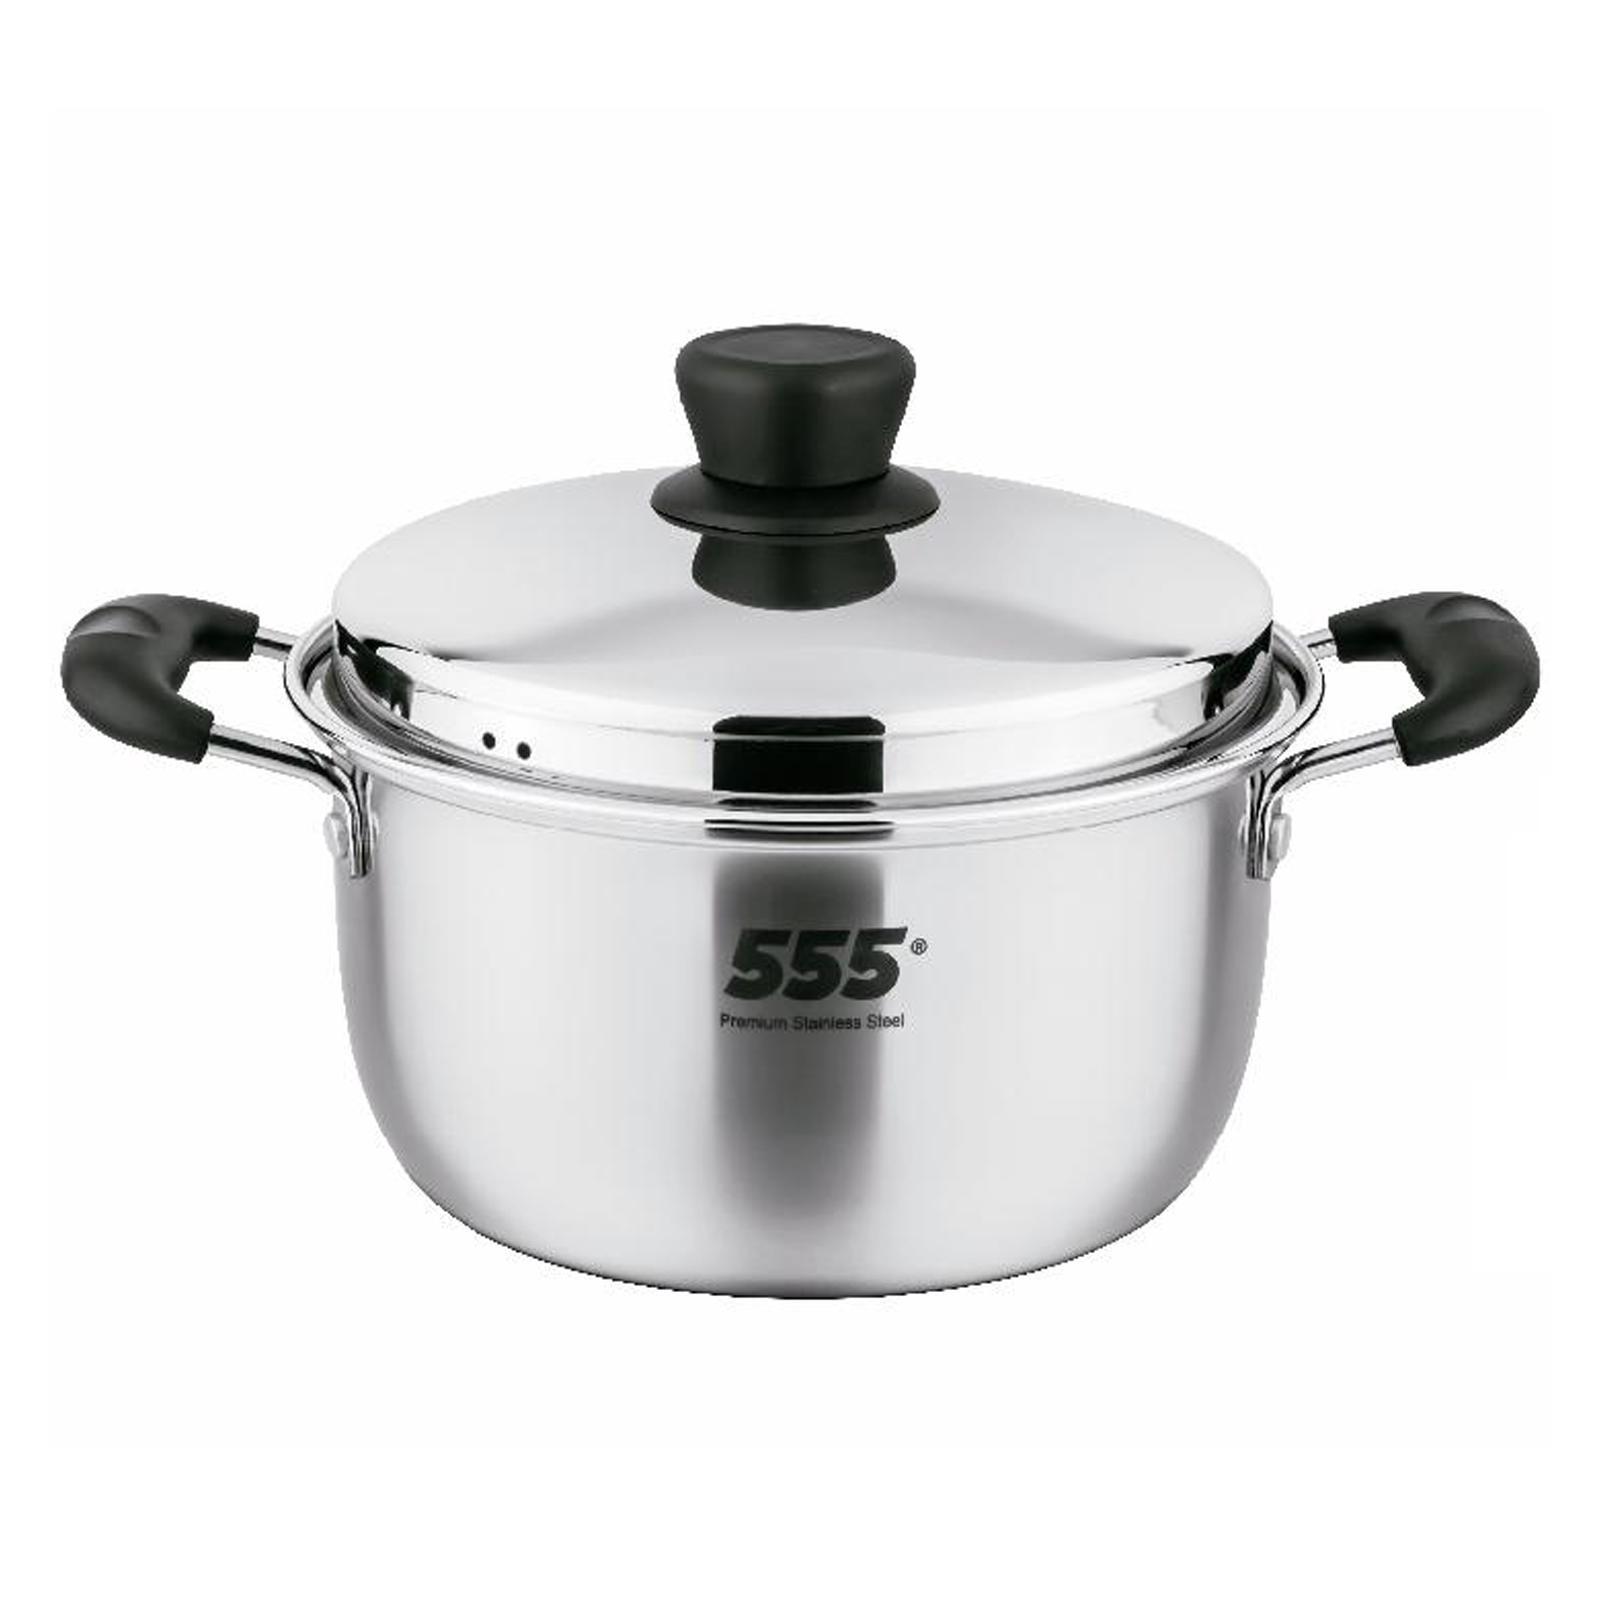 555 Premium Stainless Steel Saucepot 4.3L